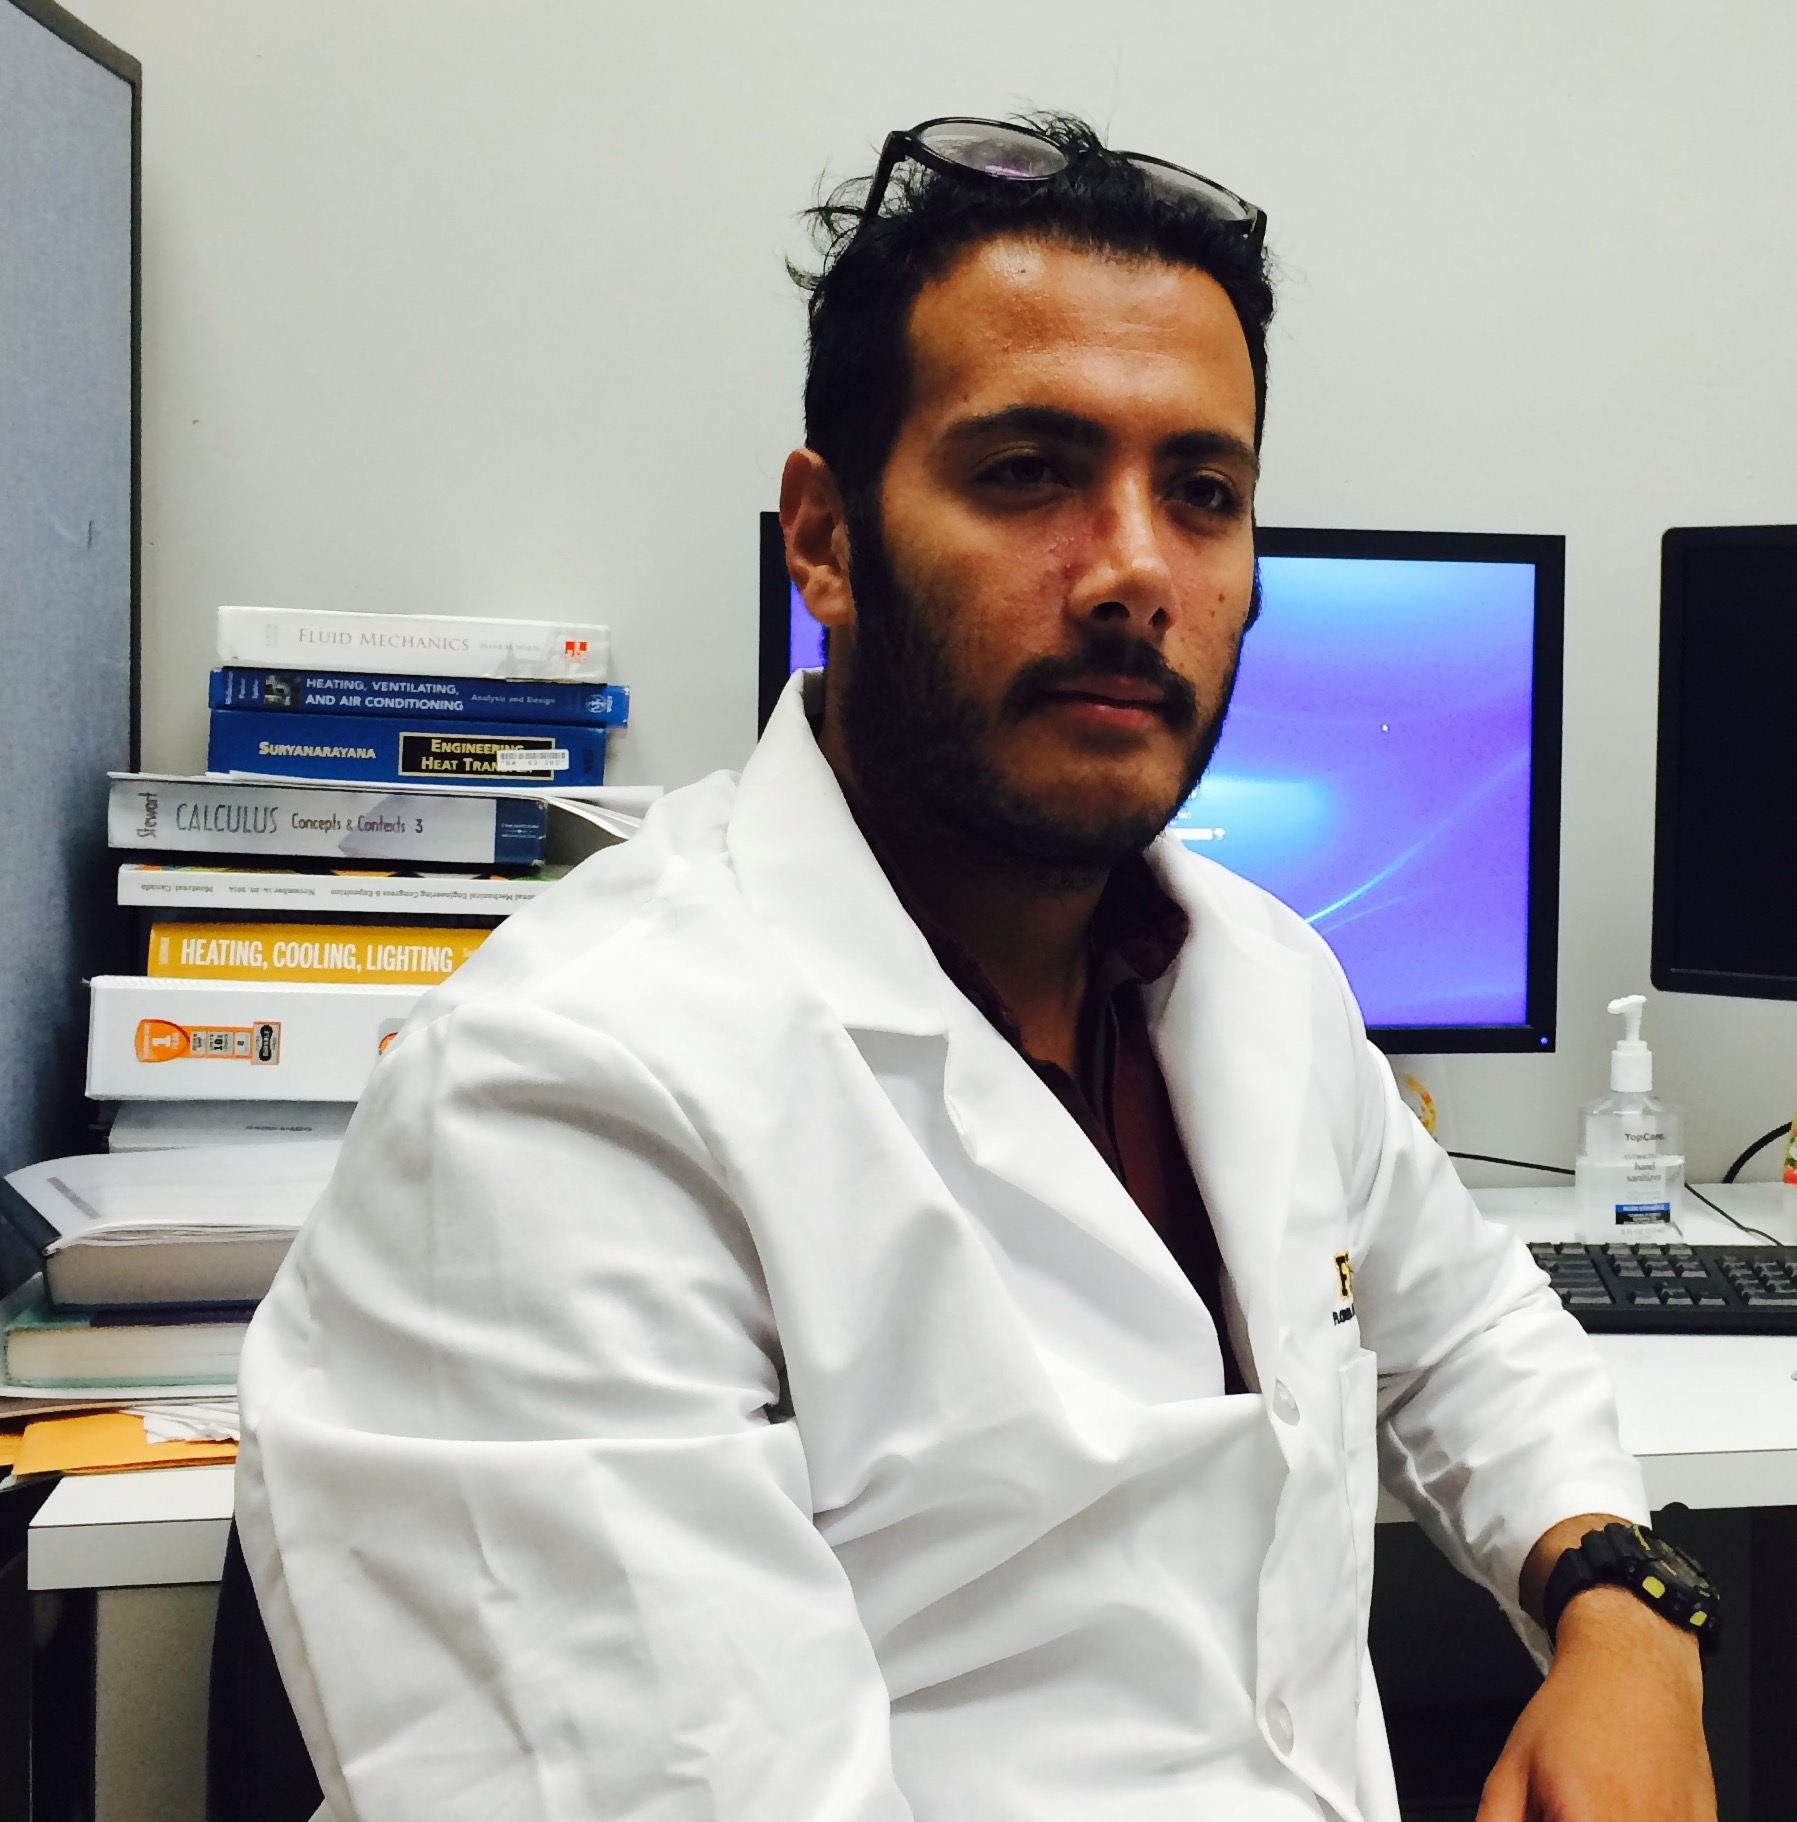 Phd dissertation biomedical engineering